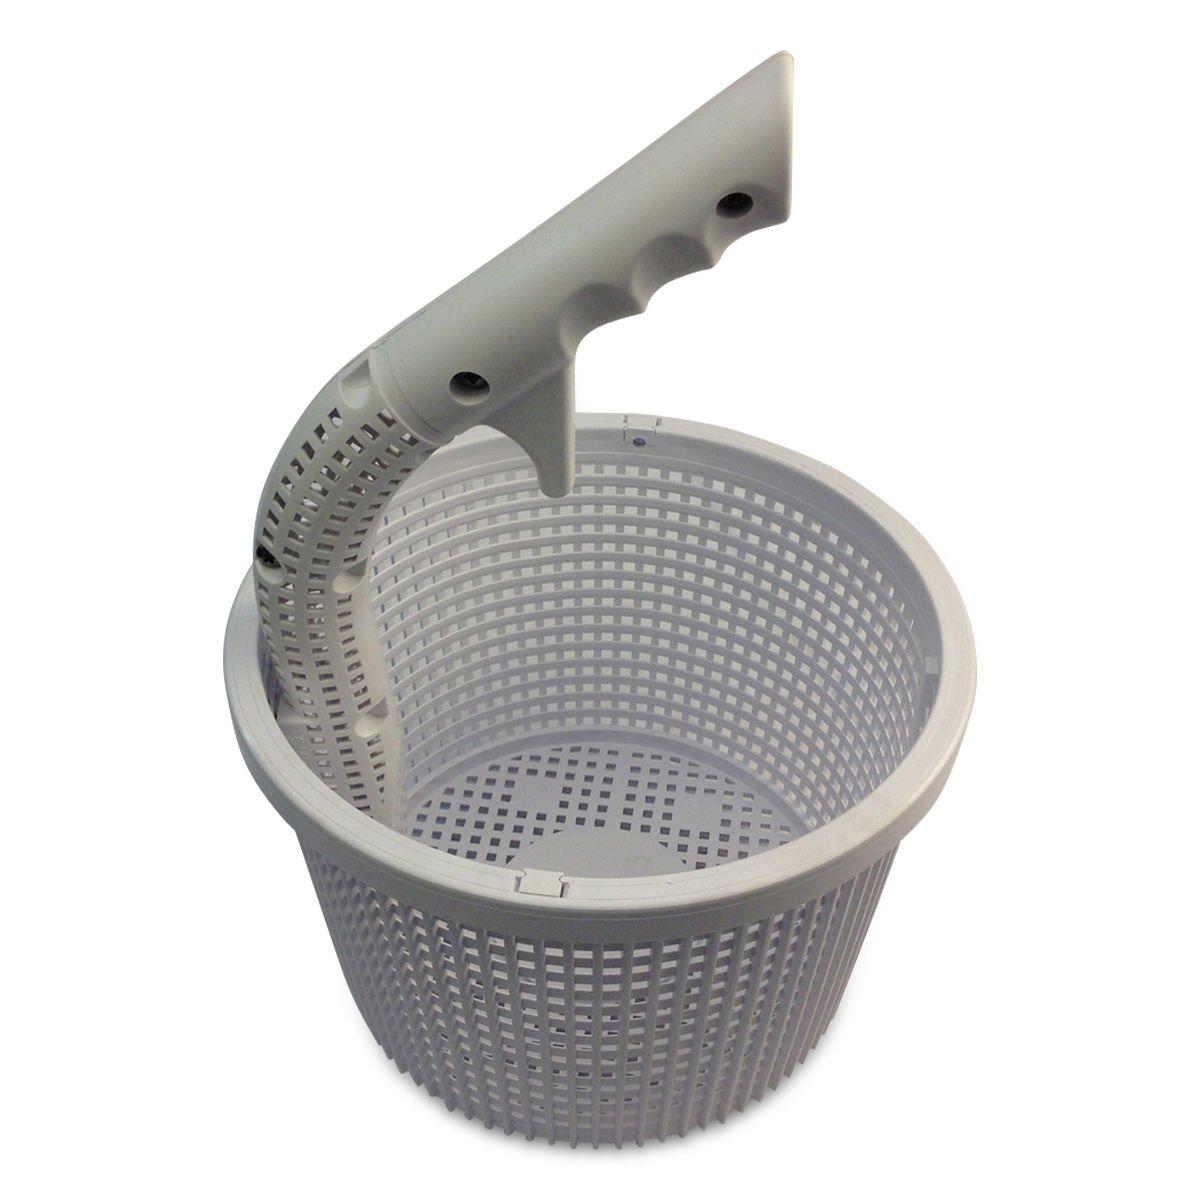 CMP Vented Handle FlowSkim Skimmer Basket 27182-300